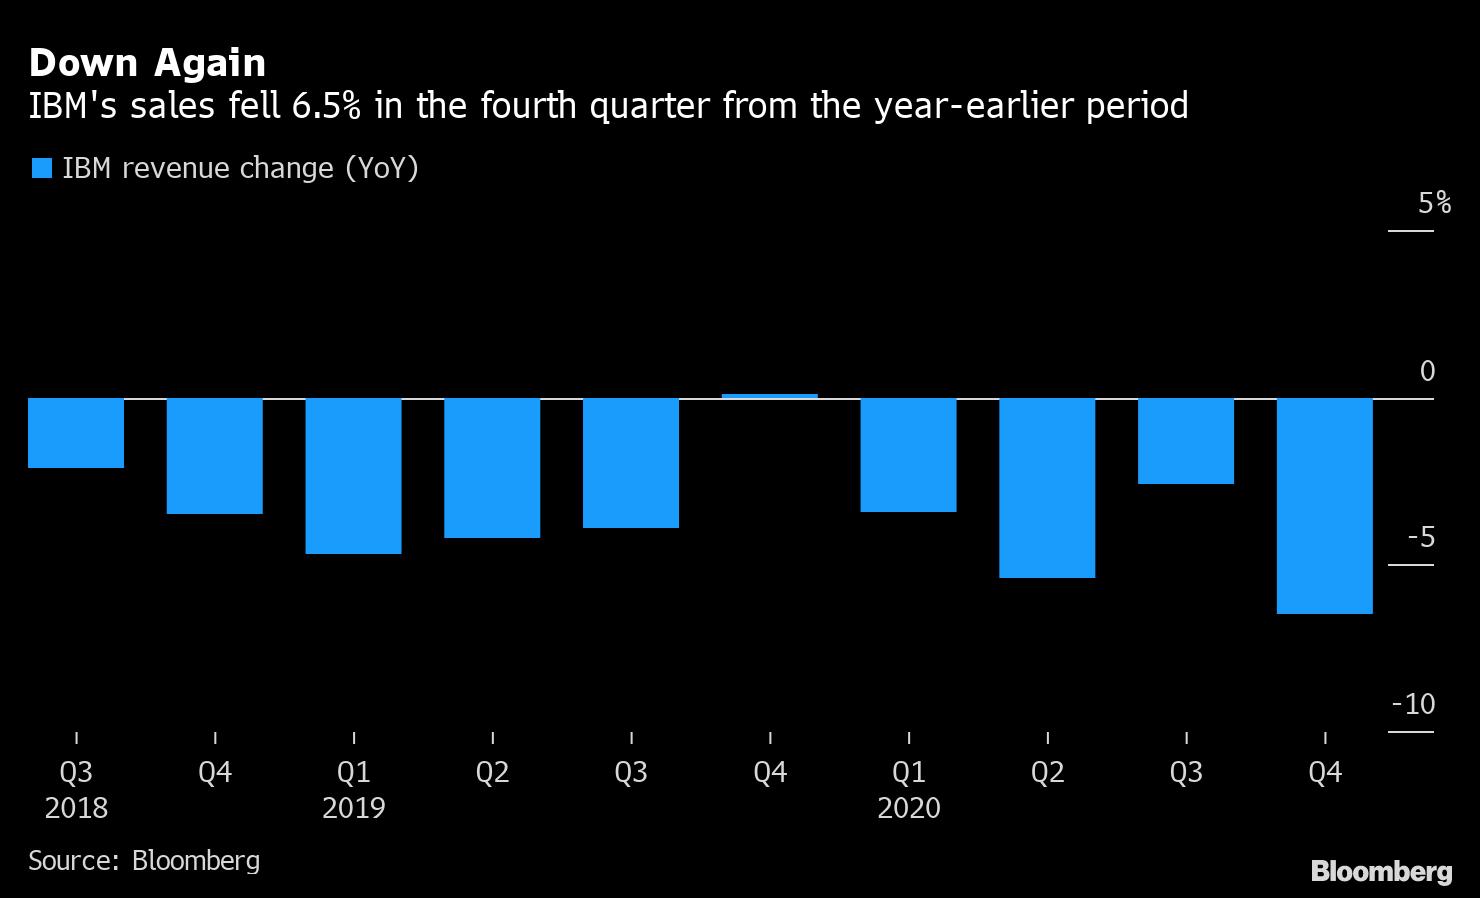 IBMの10ー12月期、売上高が市場予想に届かず-時間外で株価下落 - Bloomberg